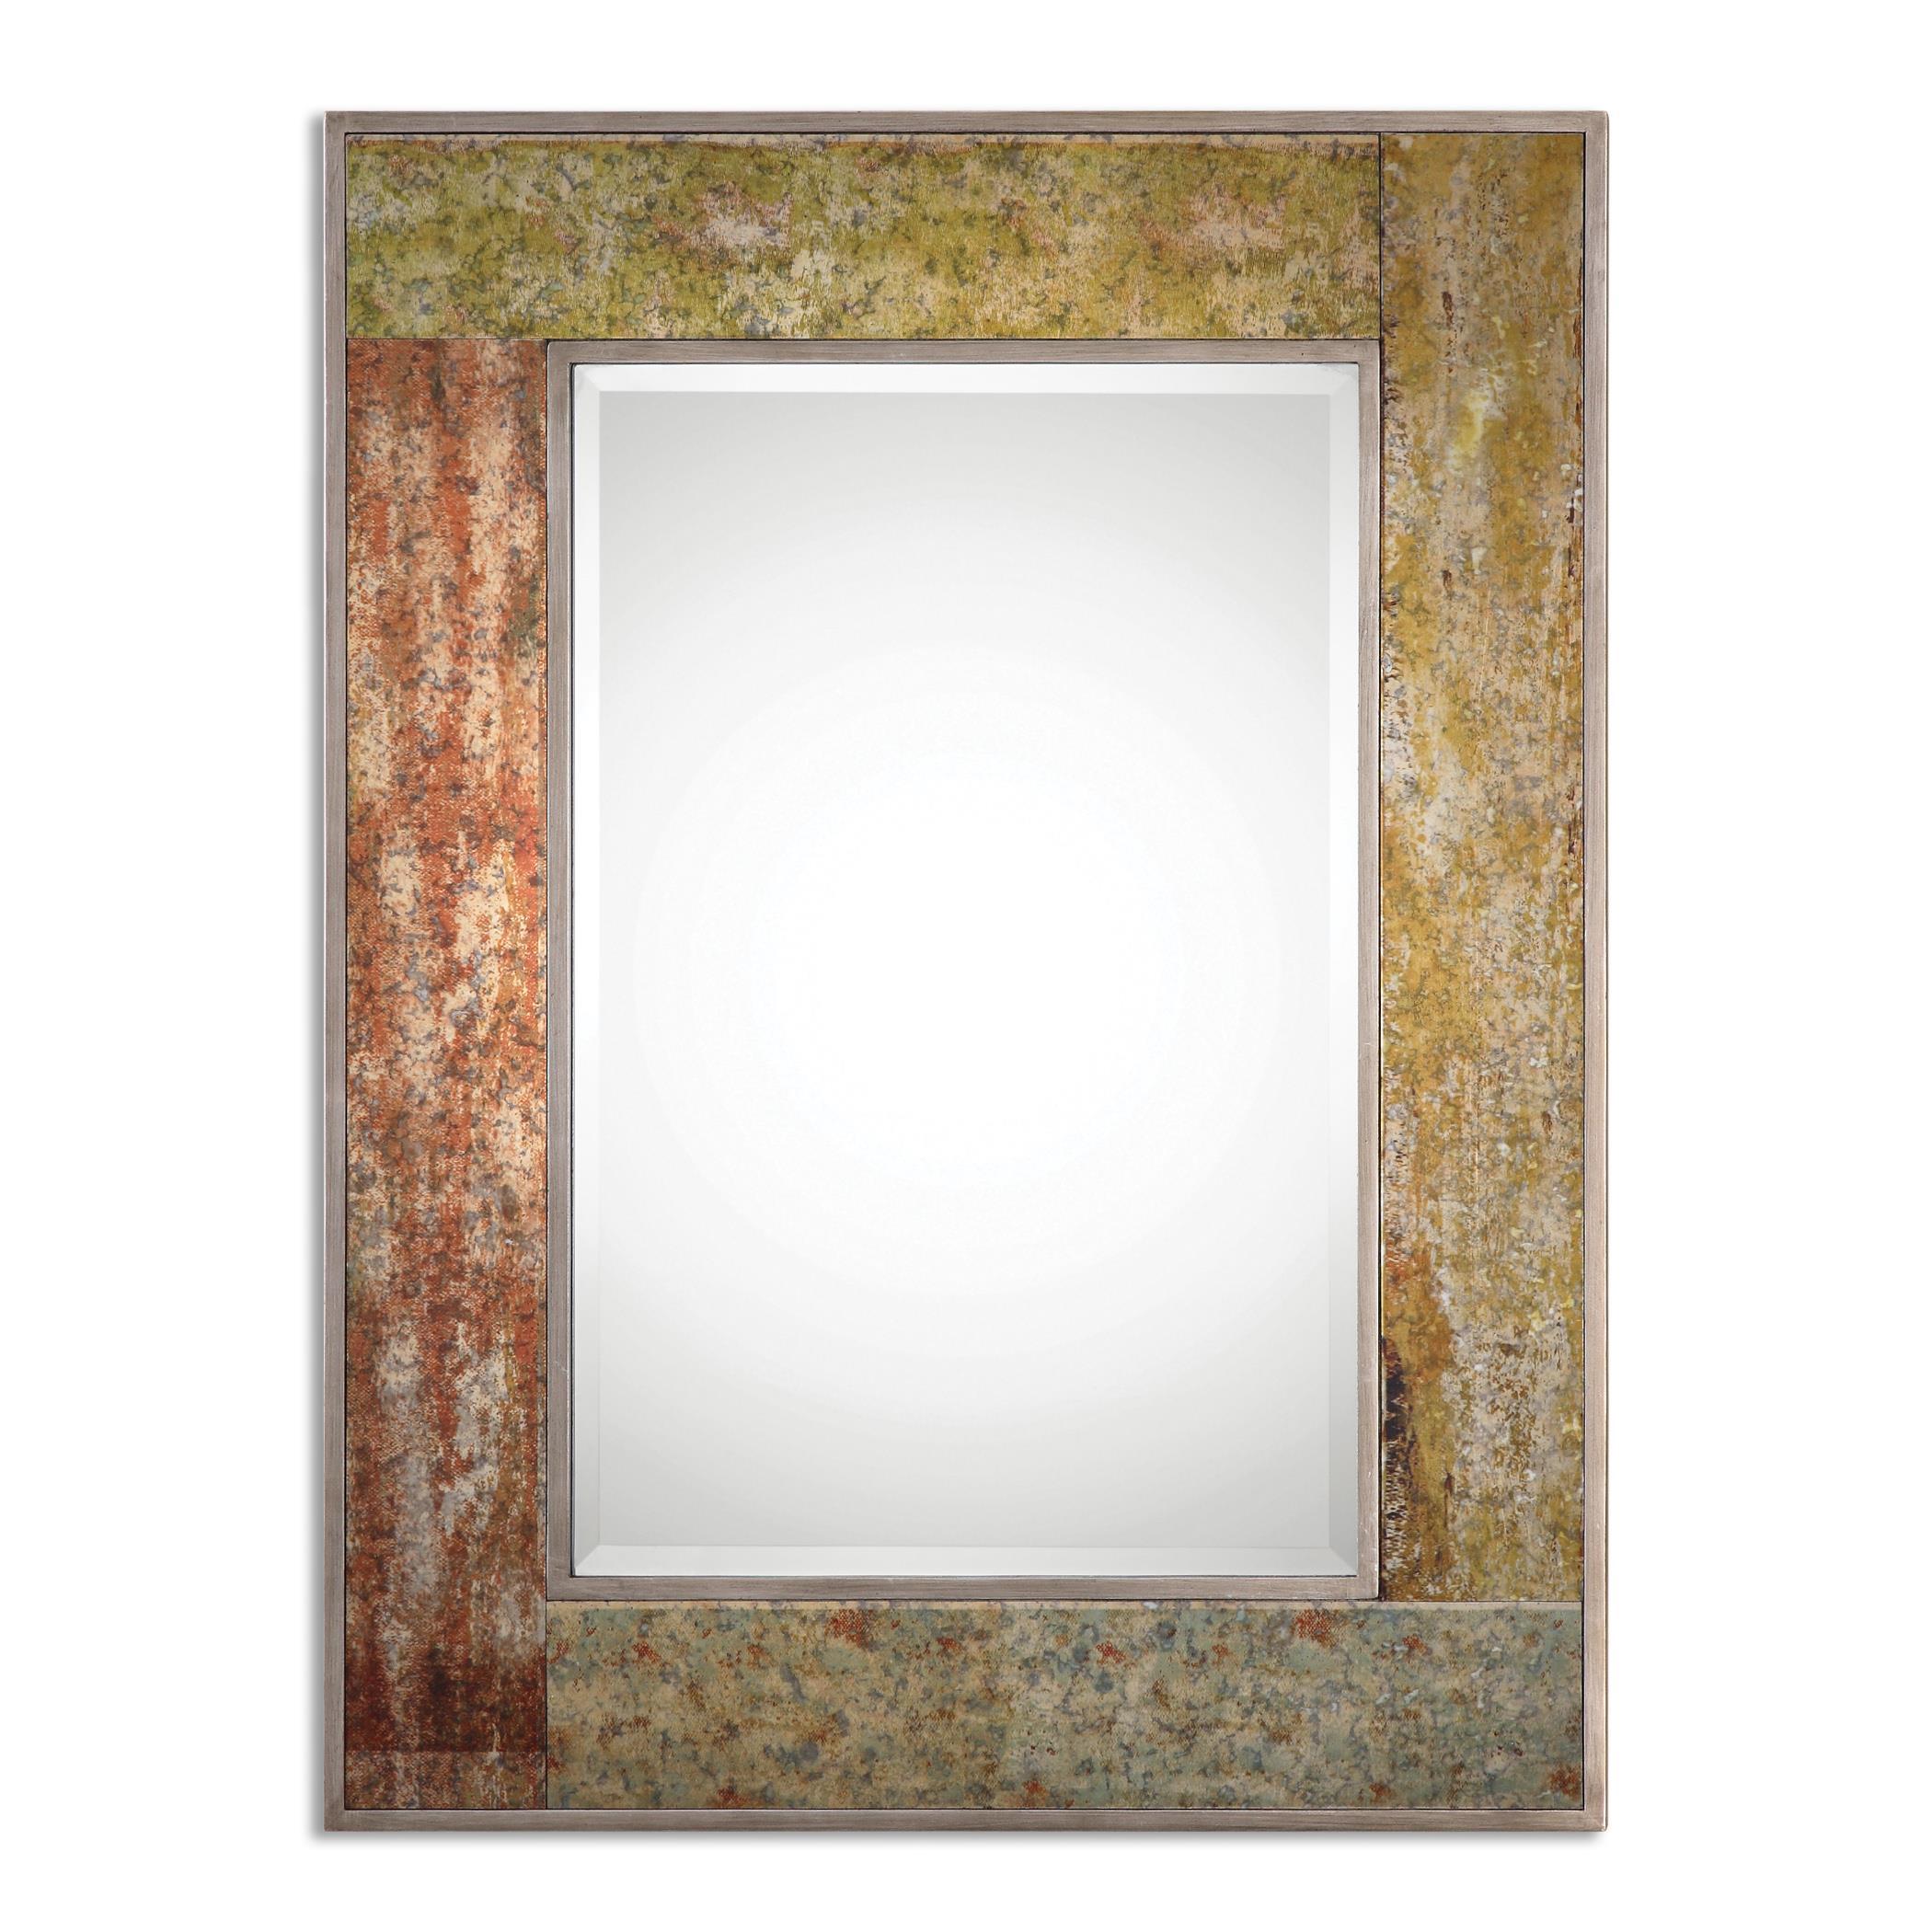 Uttermost Mirrors Romy Rust Mirror - Item Number: 13929